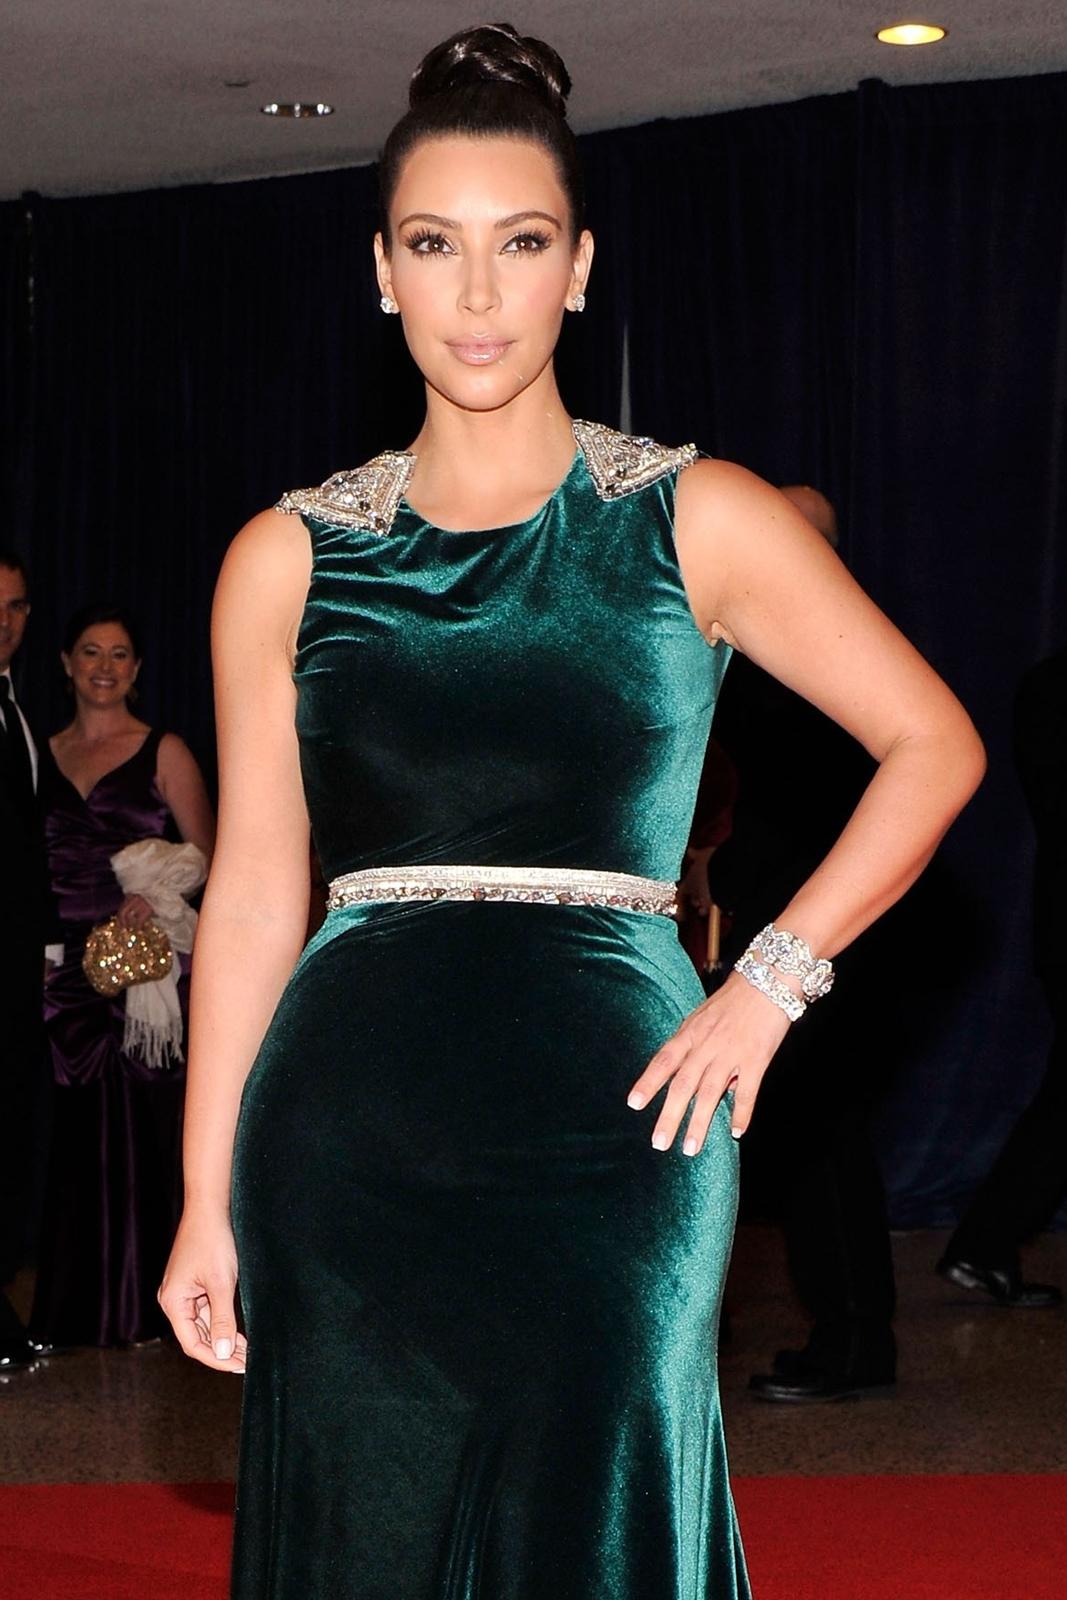 http://1.bp.blogspot.com/-ChMXY54mJfg/T-q9Kn12sTI/AAAAAAAAT7E/qq5iReLcAag/s1600/splogeblog_kim_kardashian_ballgown_ass_03%252B-%252BCopy.jpg